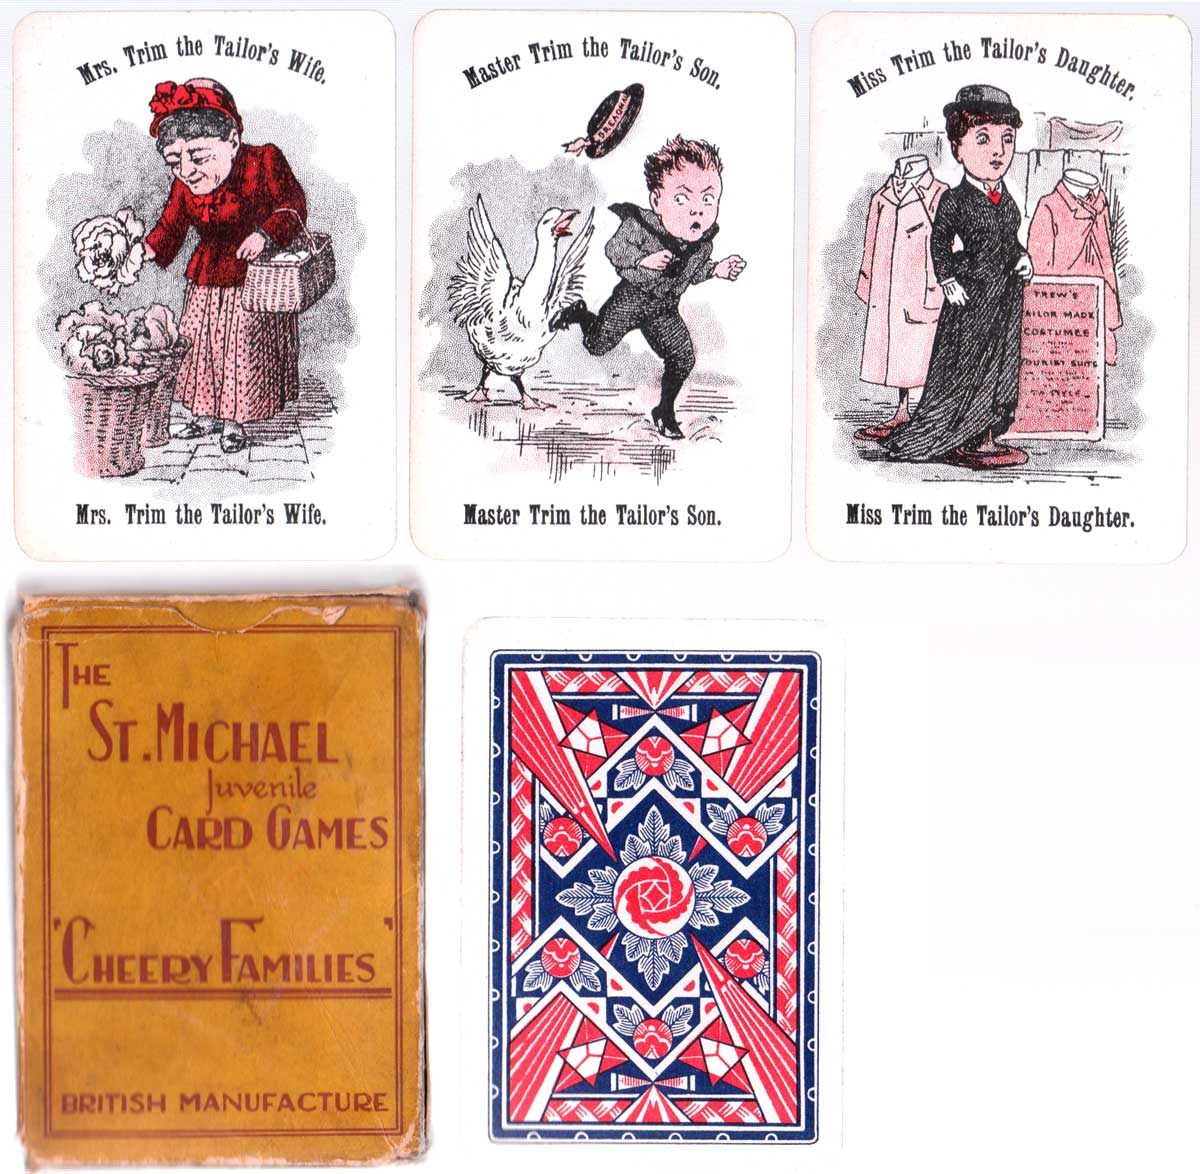 Cheery Families economy edition printed by De La Rue & Co., Ltd, c.1930s